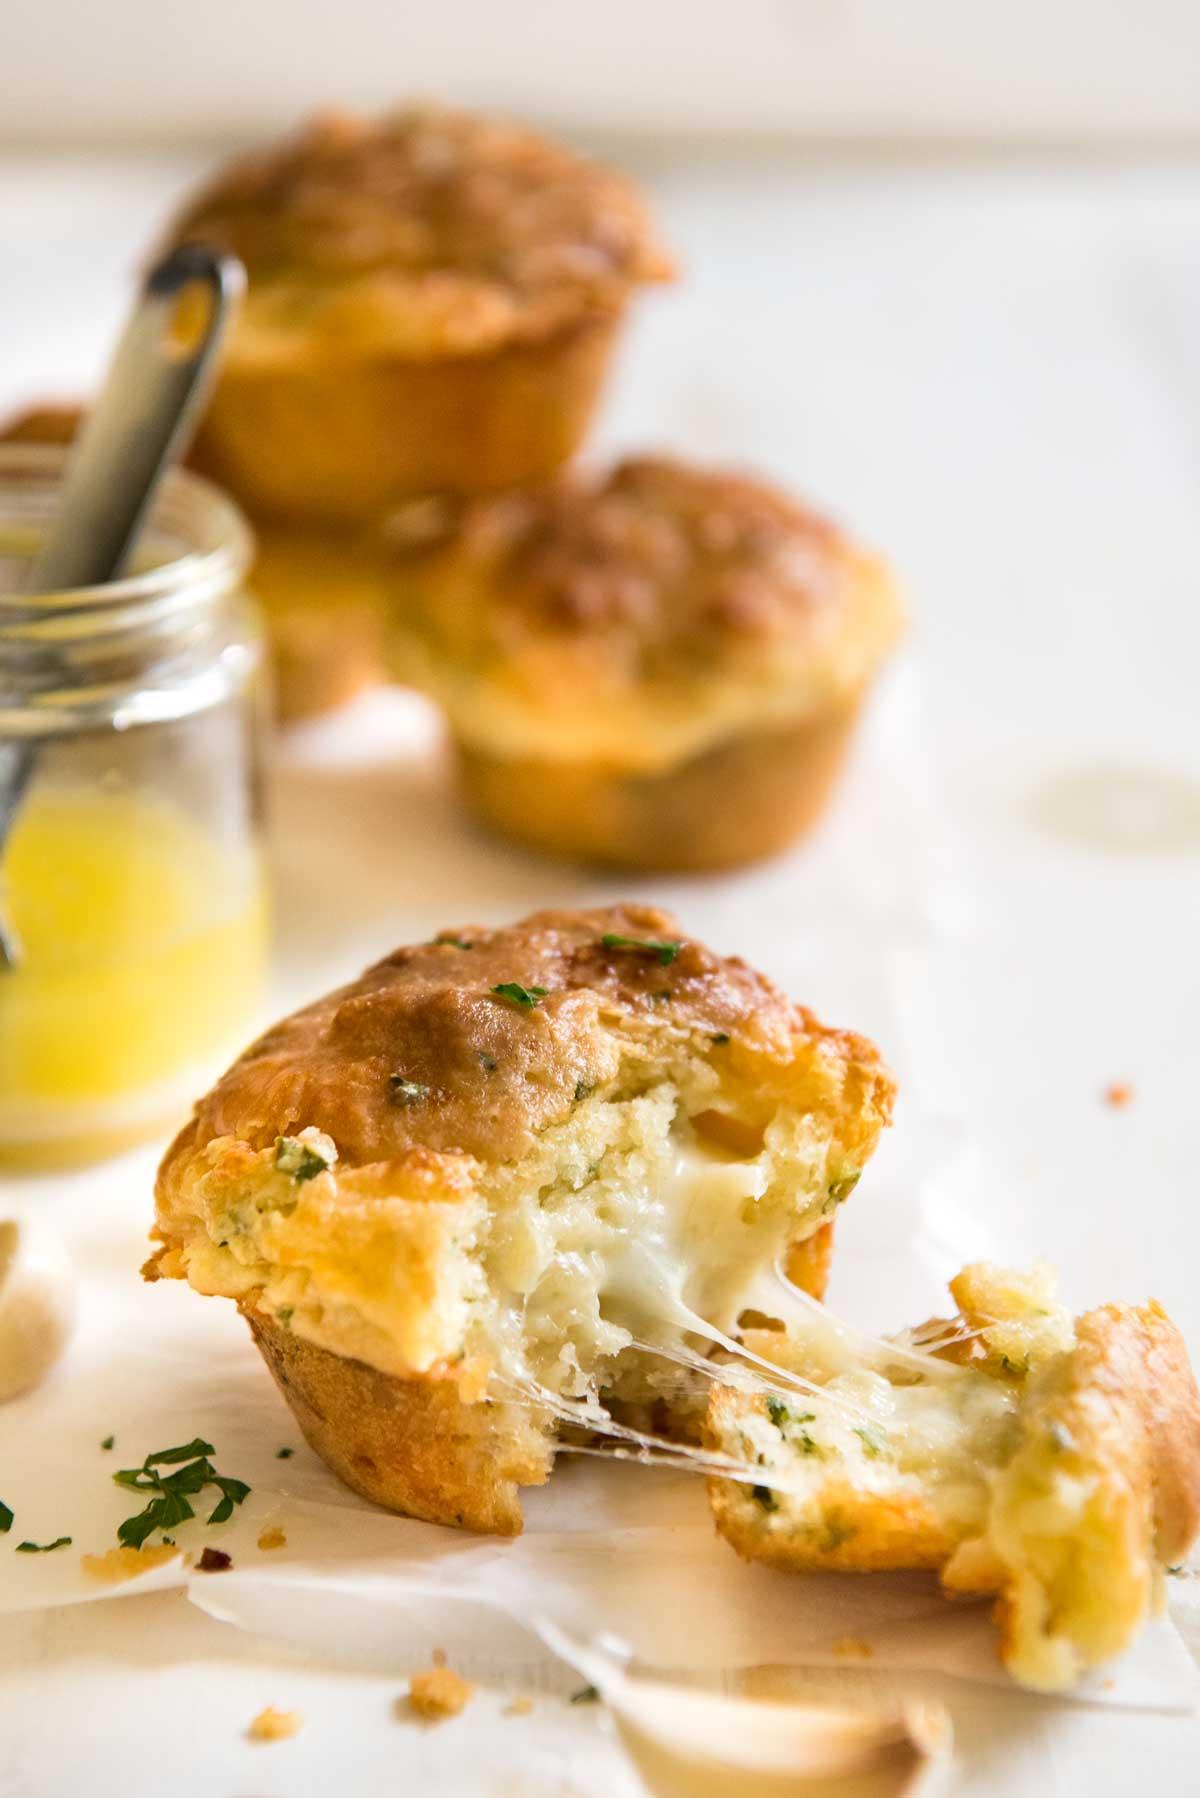 Cheese & Garlic Muffins from Recipe Tin Eats